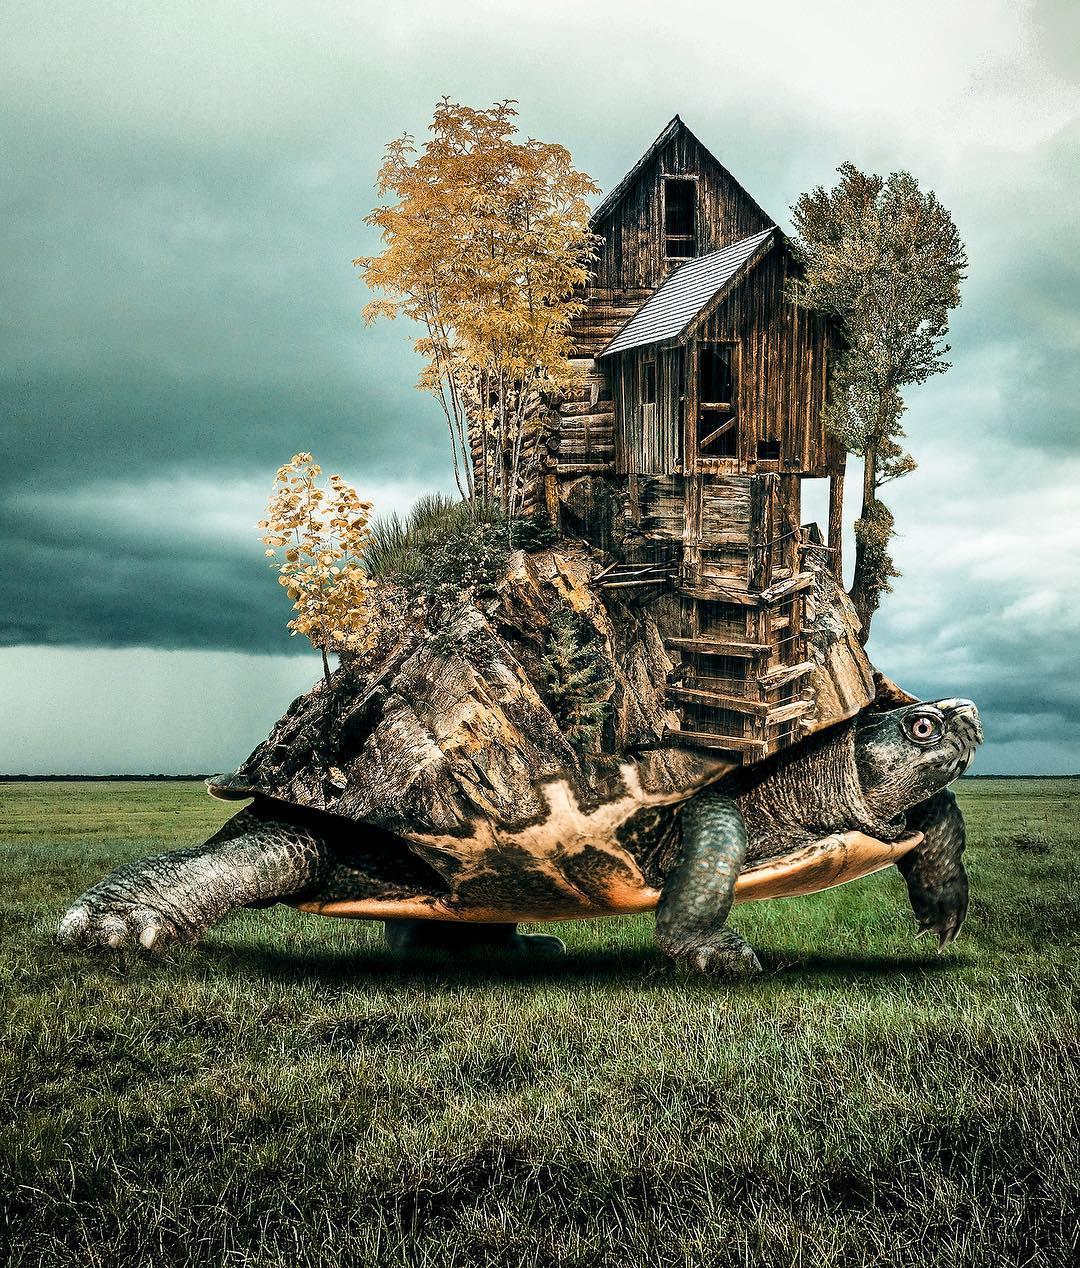 Digital Photo Collages of Dreamlike Scenes by Huseyin Sahin